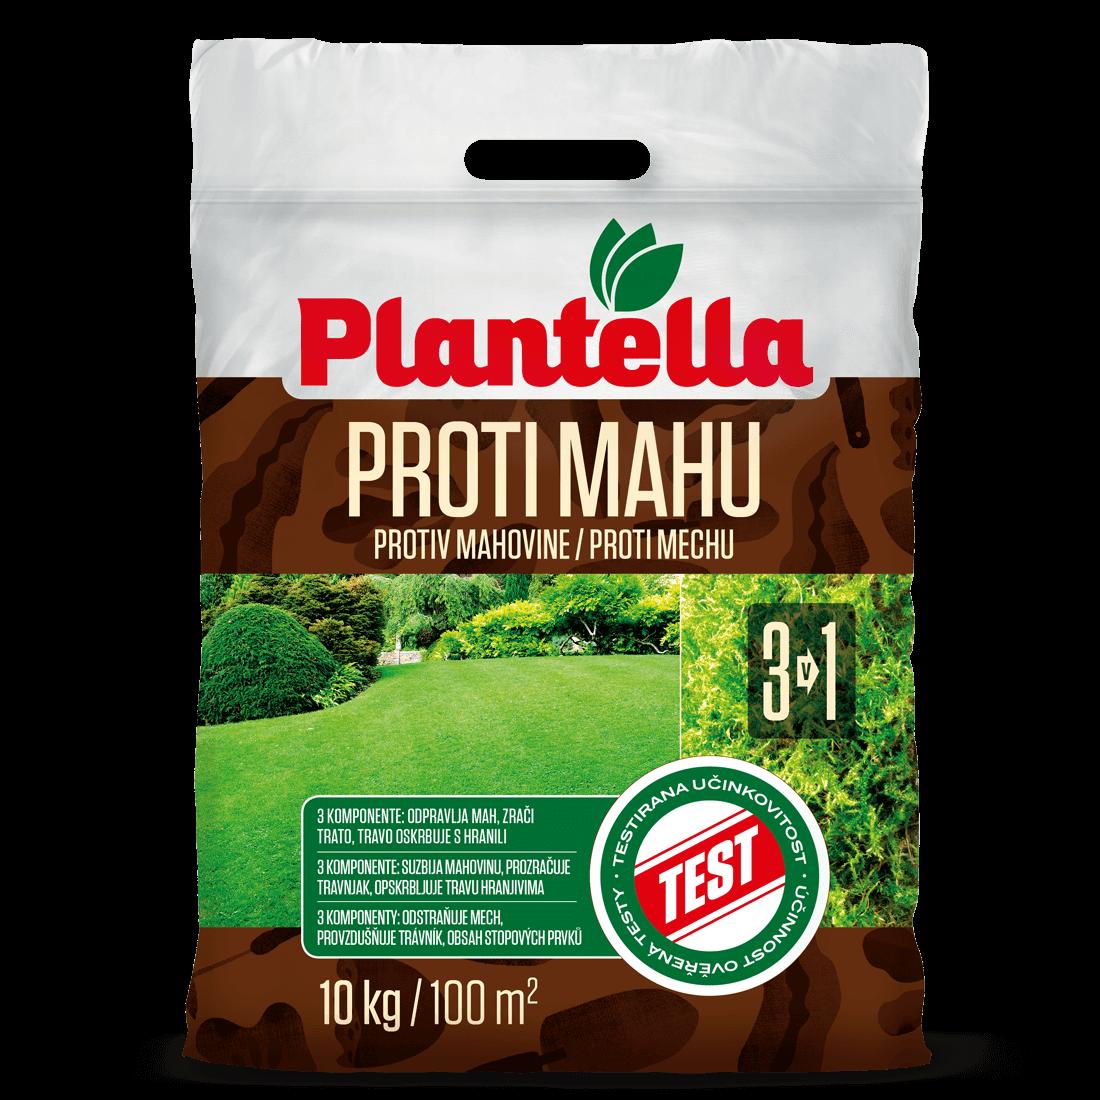 Plantella_Proti-mahu_10kg_SI-HR-CZ